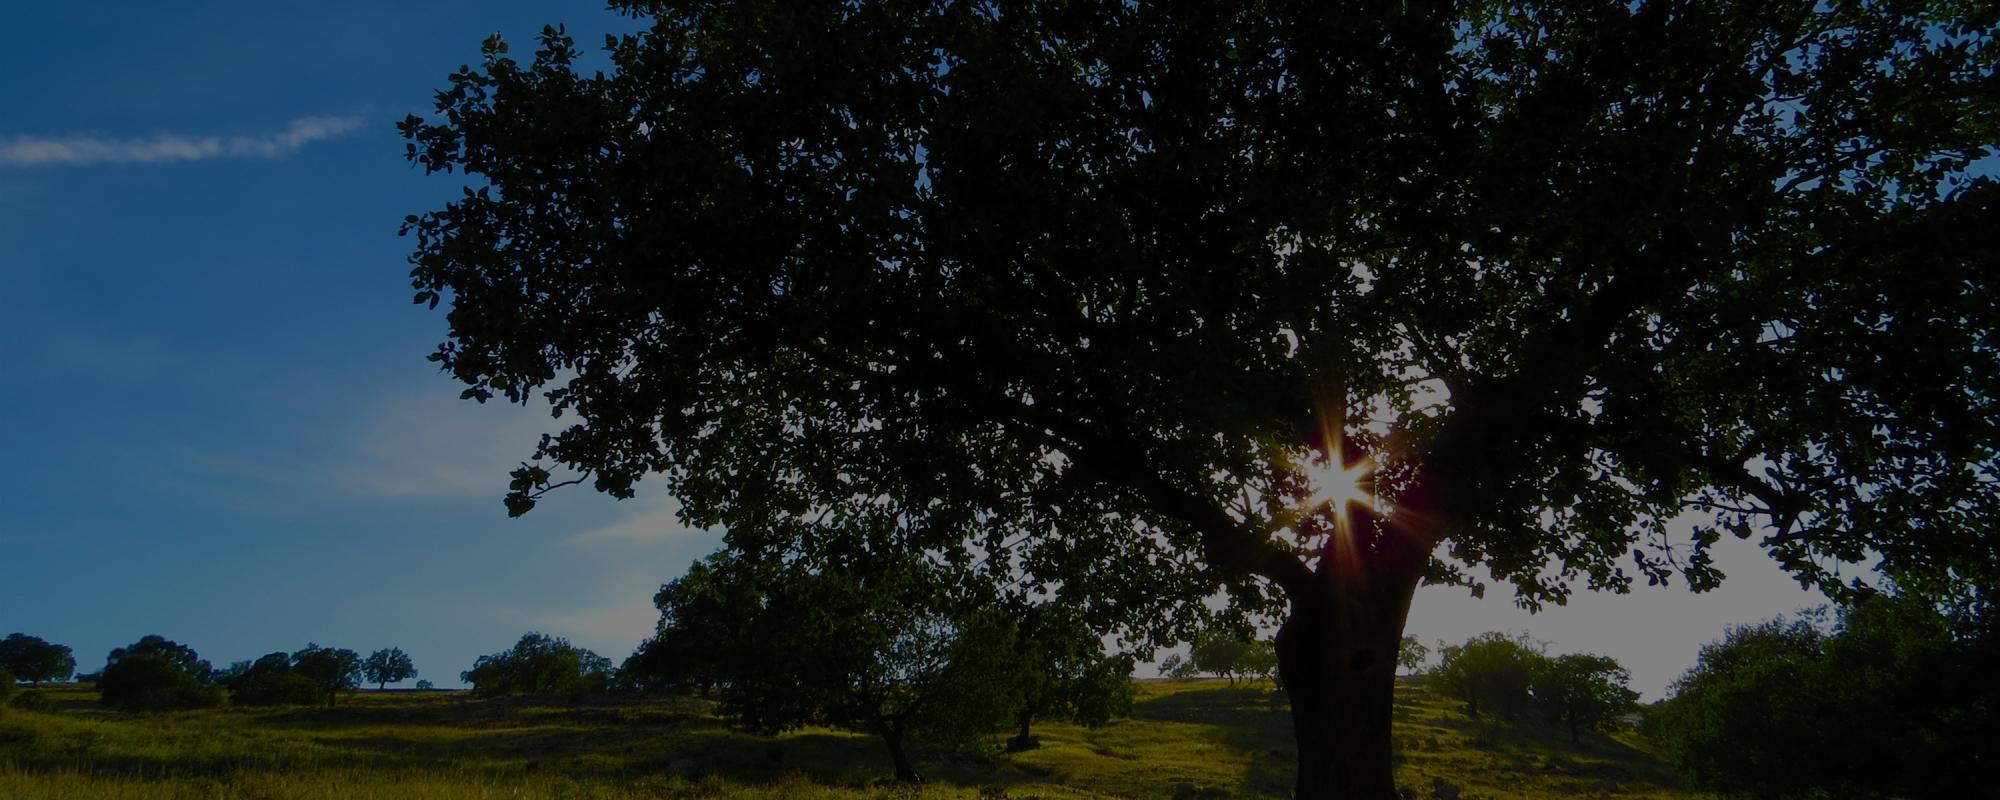 tree-3-dark